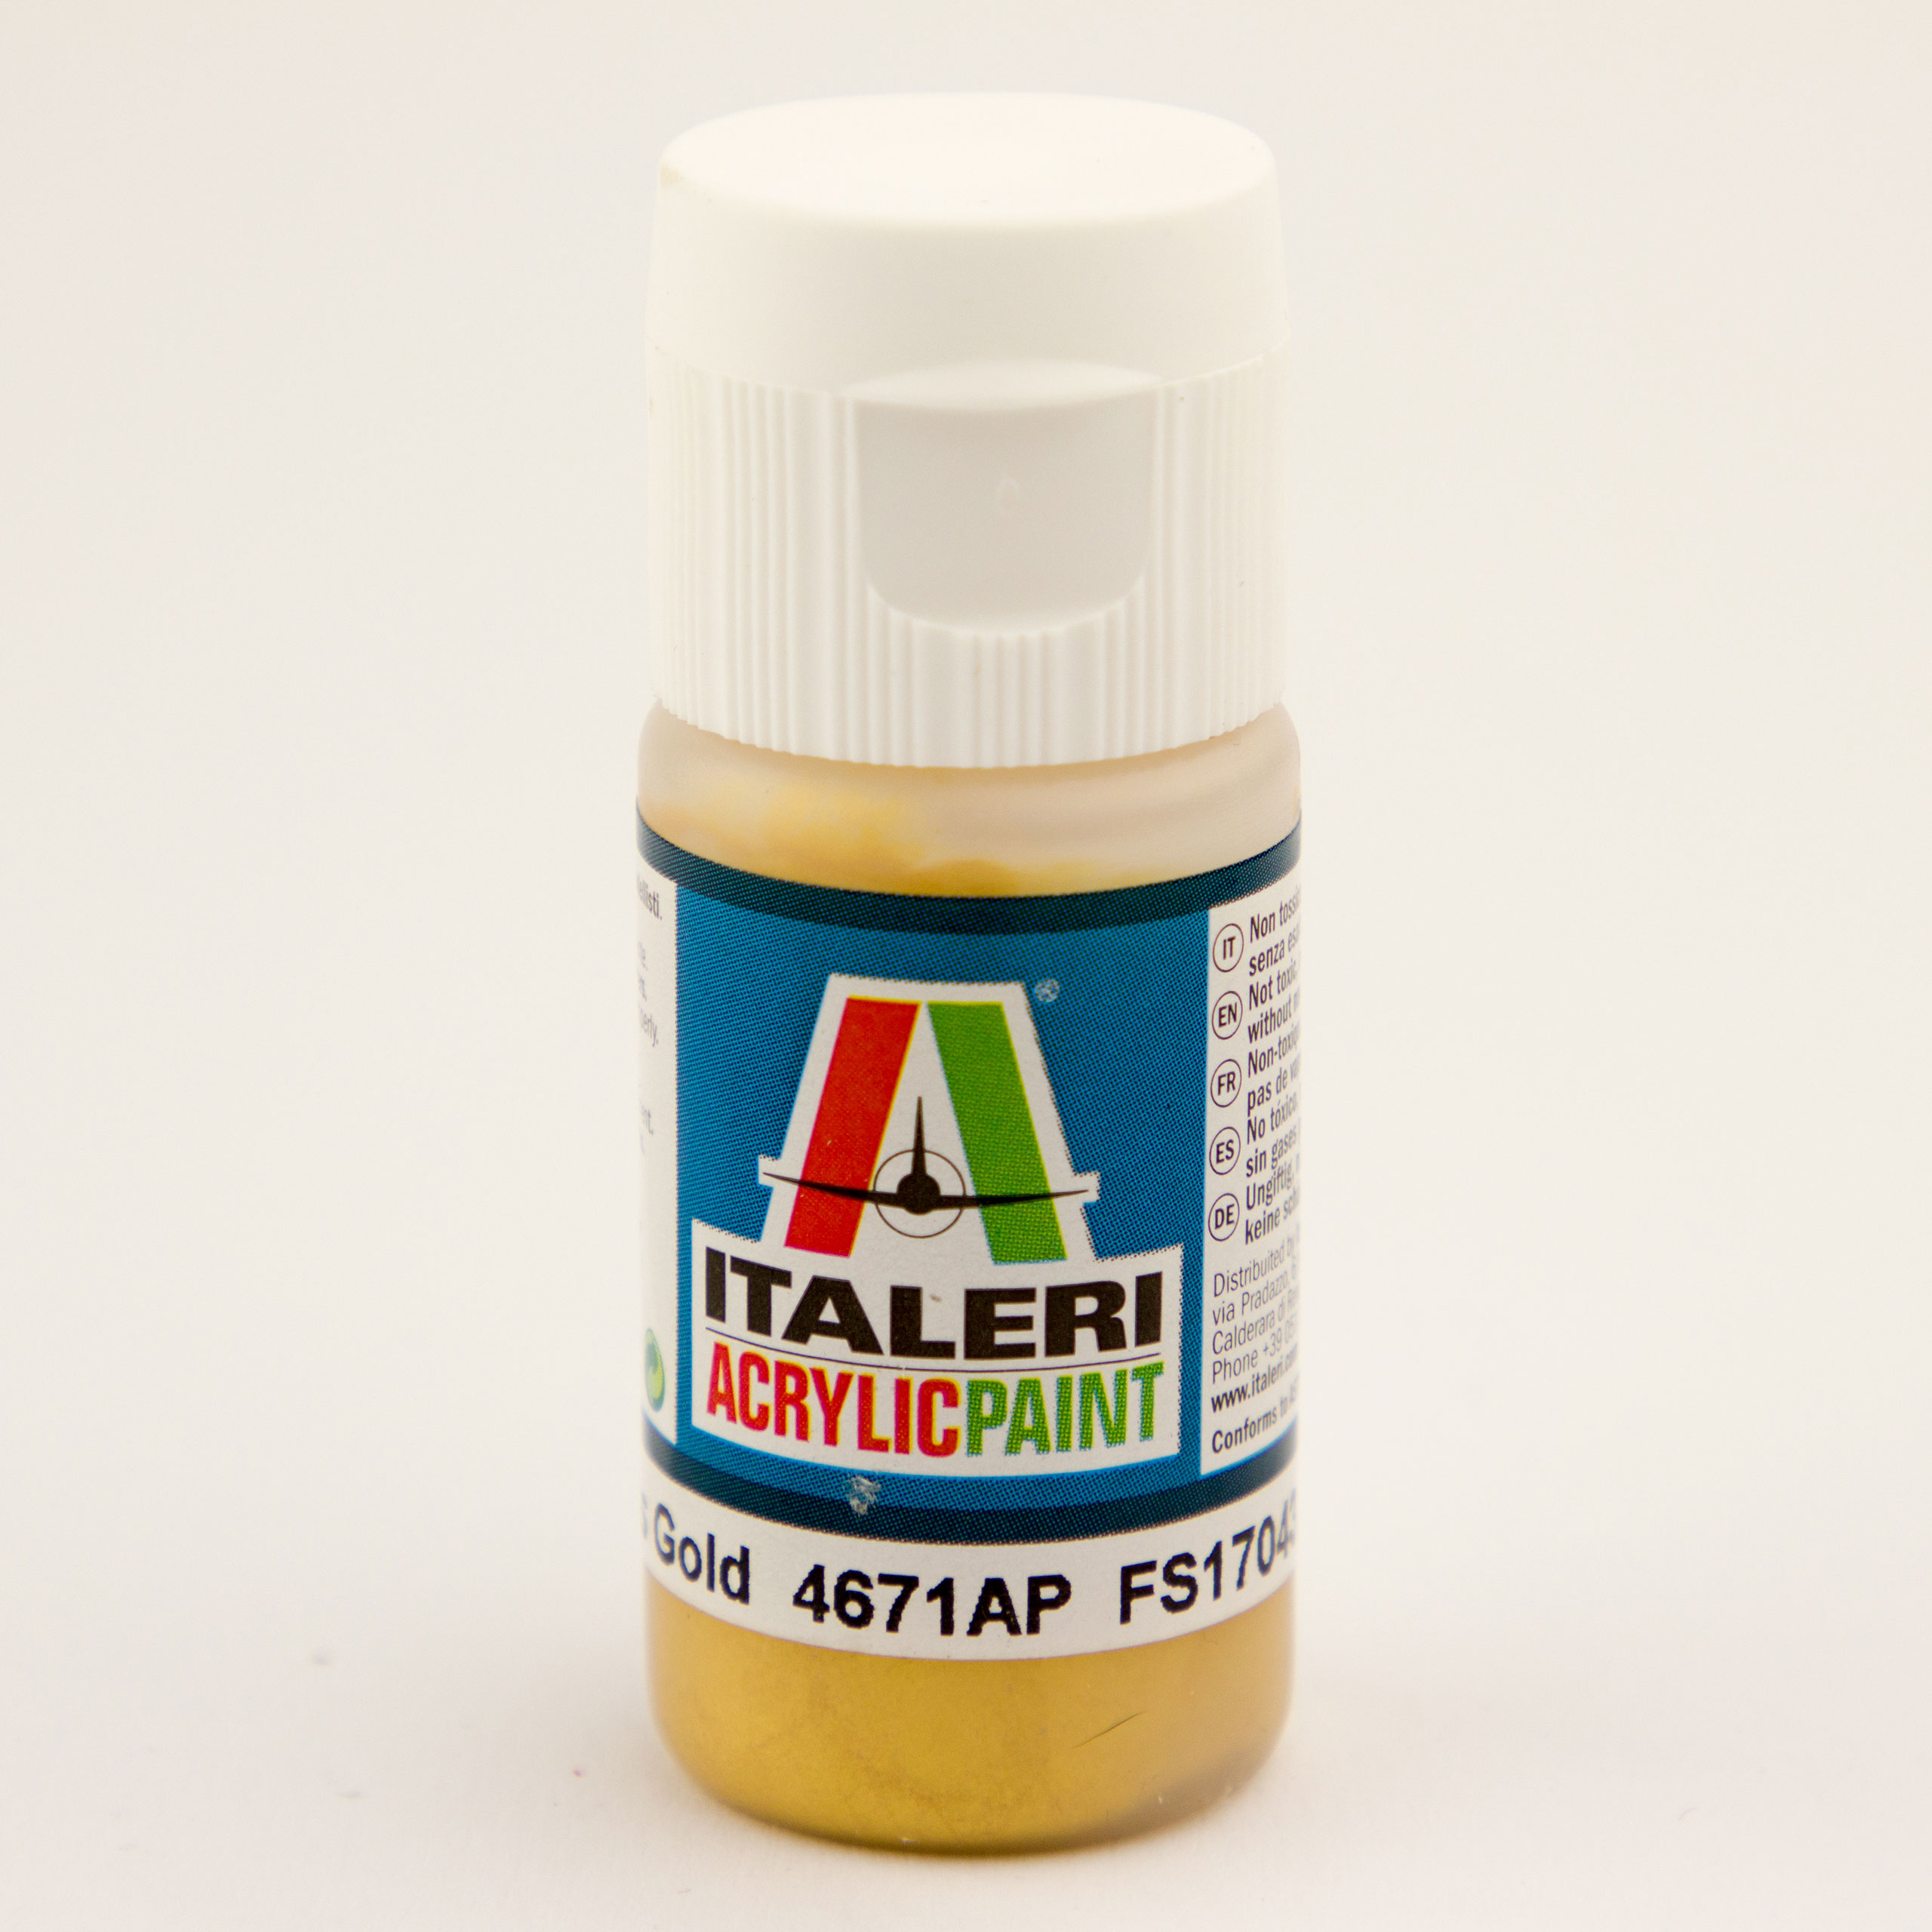 Italeri IT Acrylfarbe 4671 Gold glänzend 20 ml Airbrush Farbe